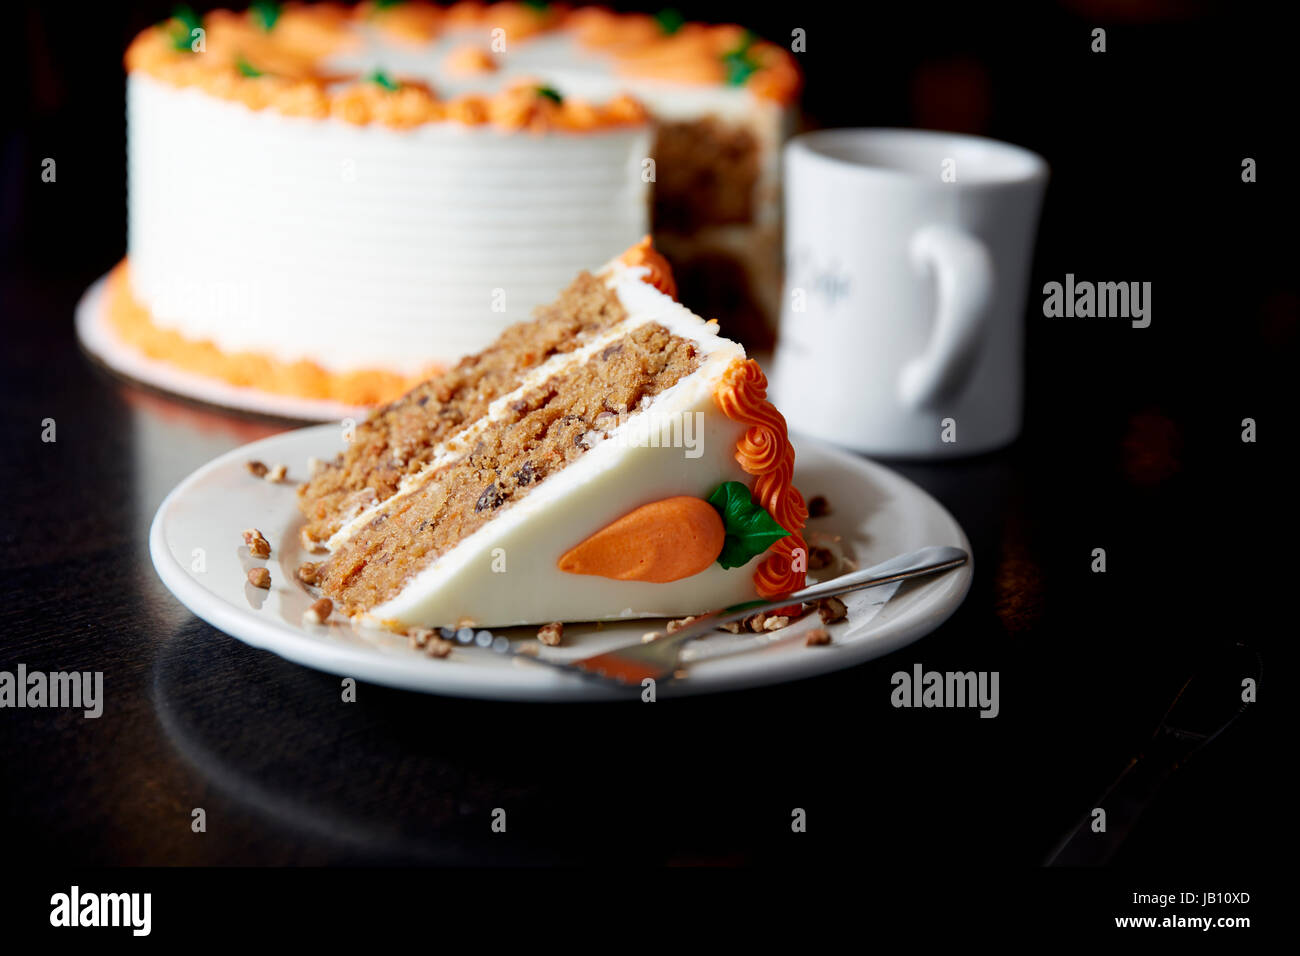 Carrot Cake, Cake, Cream Cheese Frosting, Dessert, Coffee - Stock Image